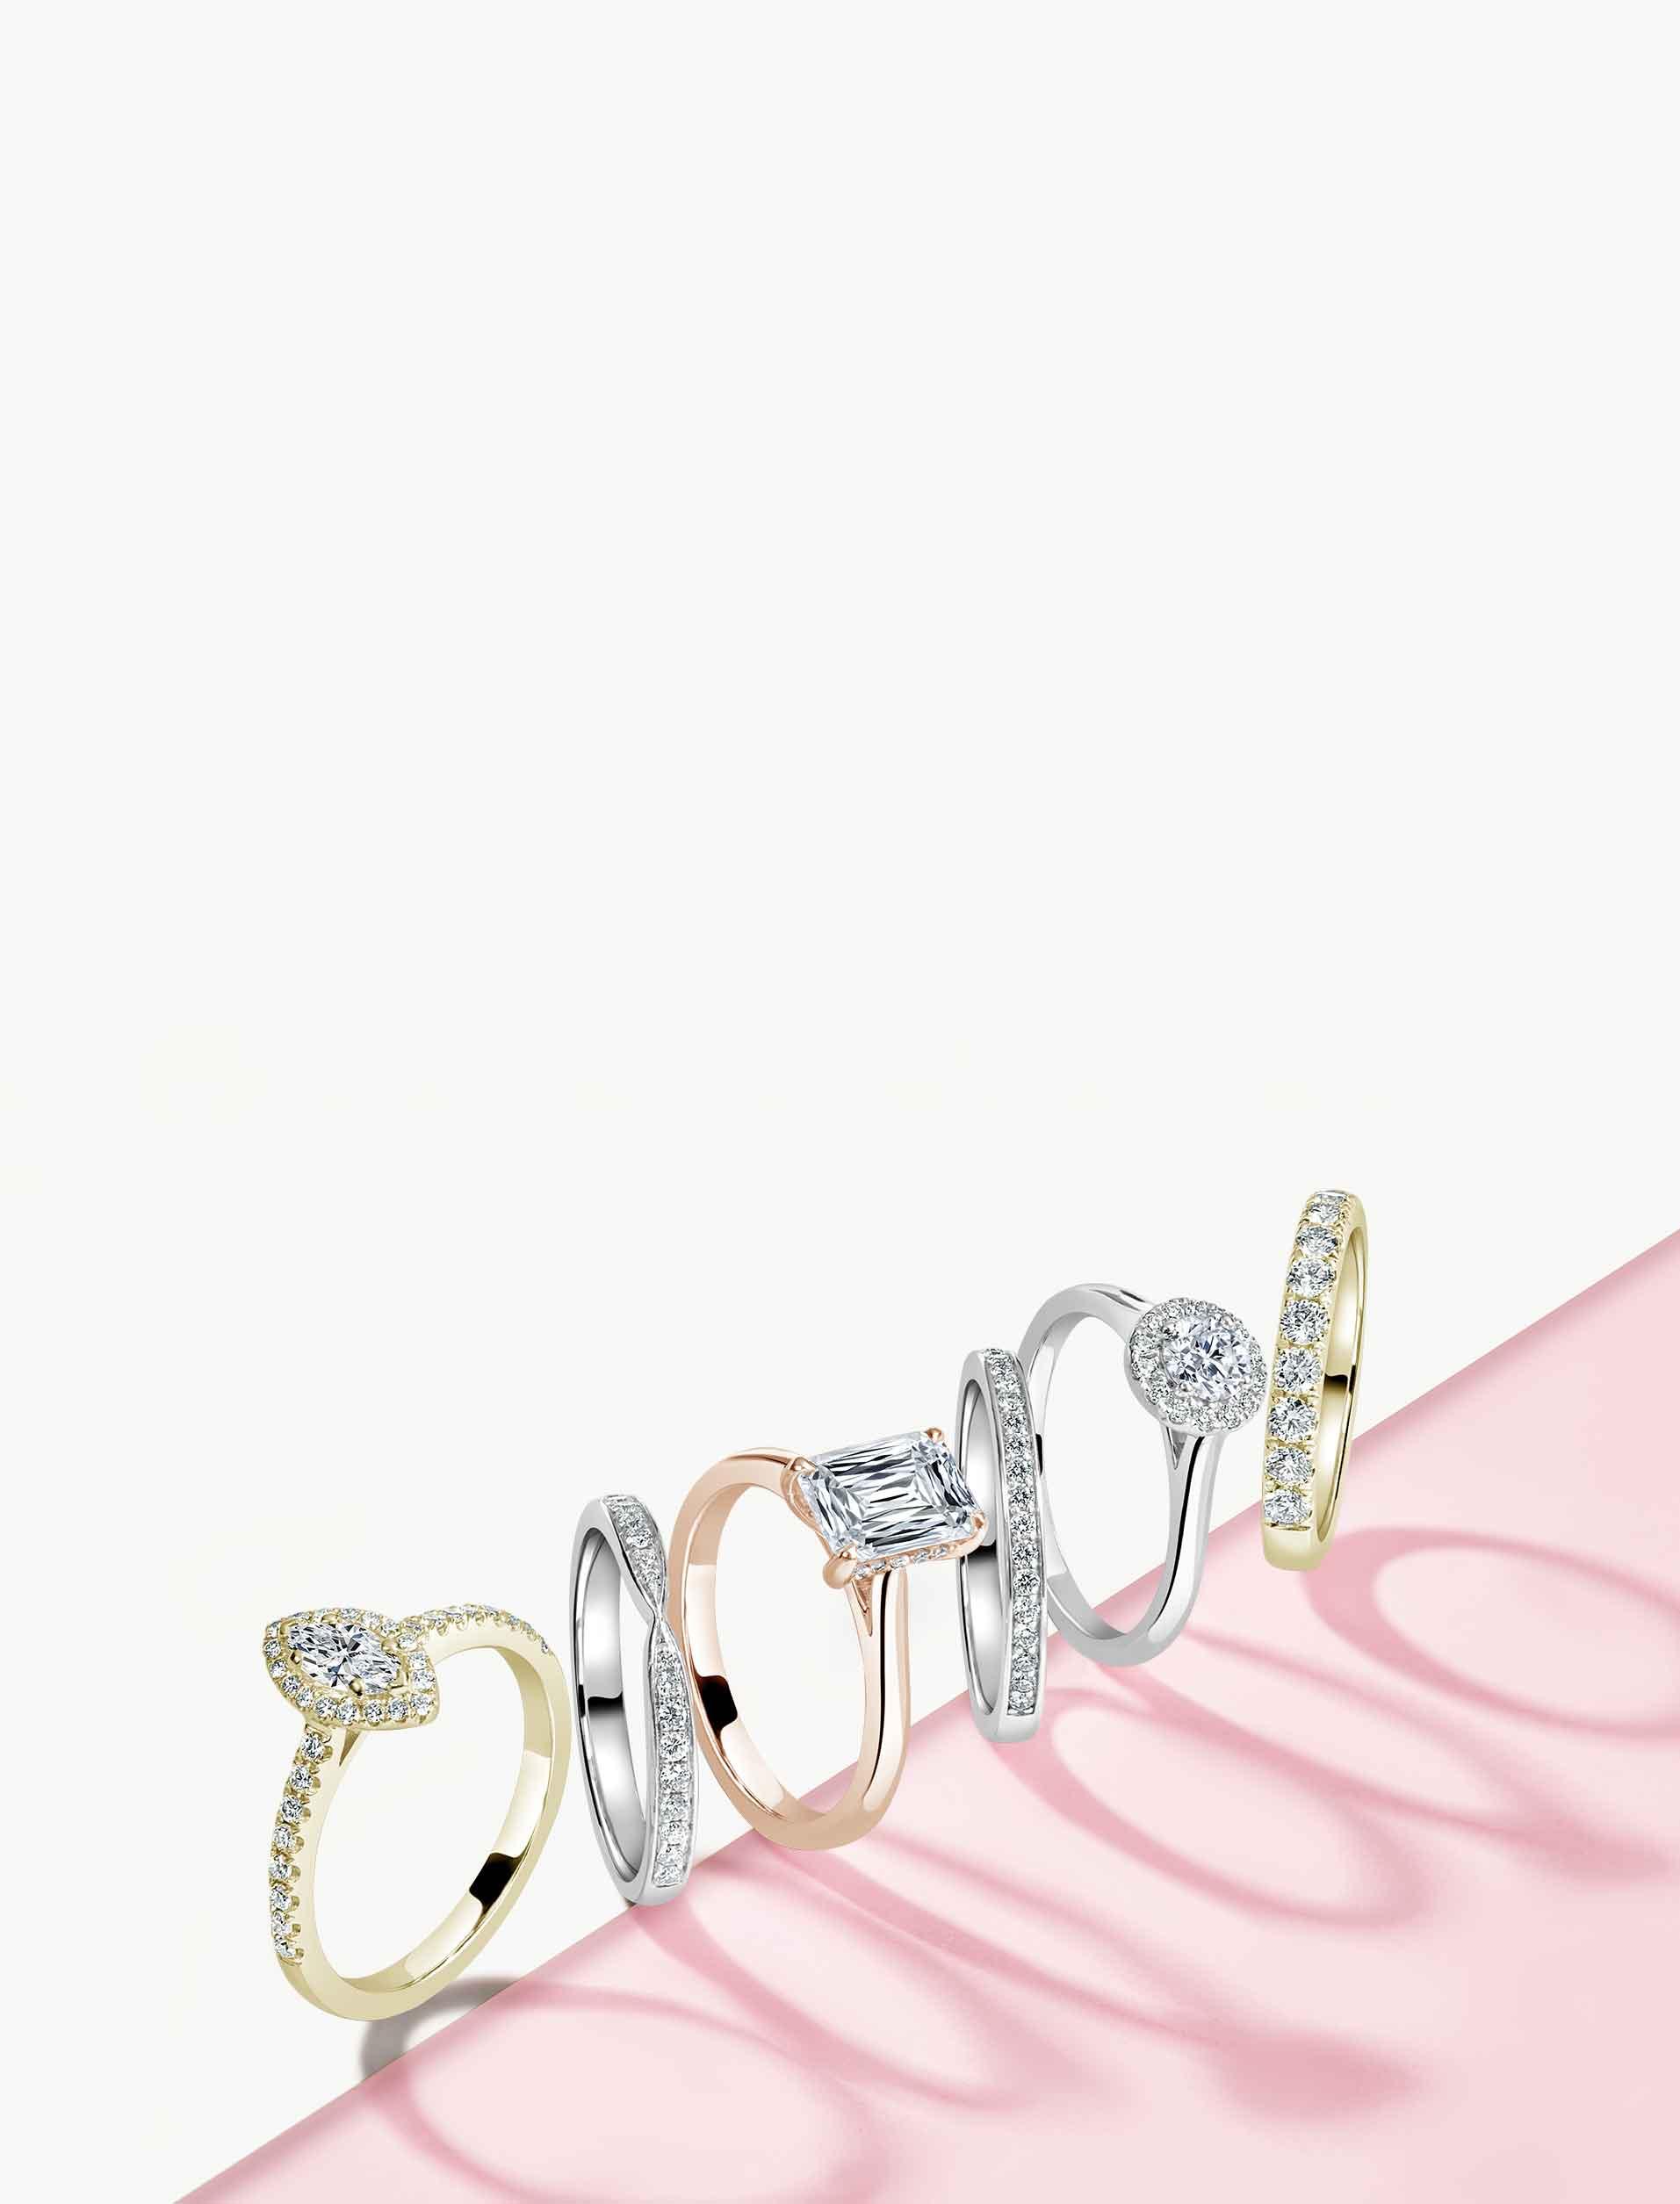 Princess Cut Shoulder Set Engagement Rings - Steven Stone